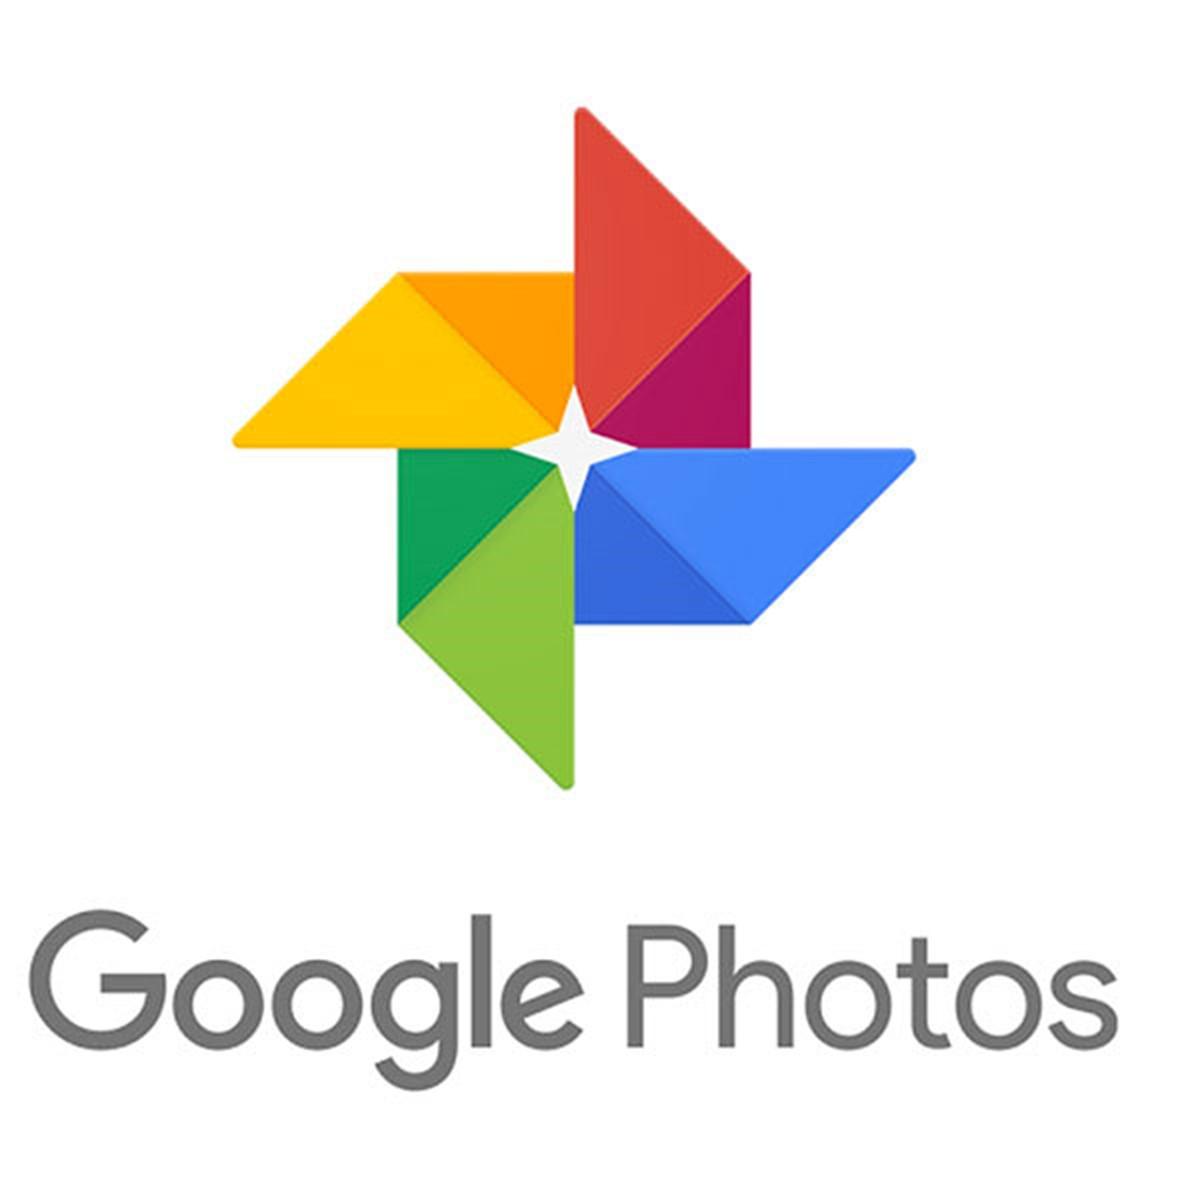 Google adds auto image rotation, GIF creation to Photos app: Digital